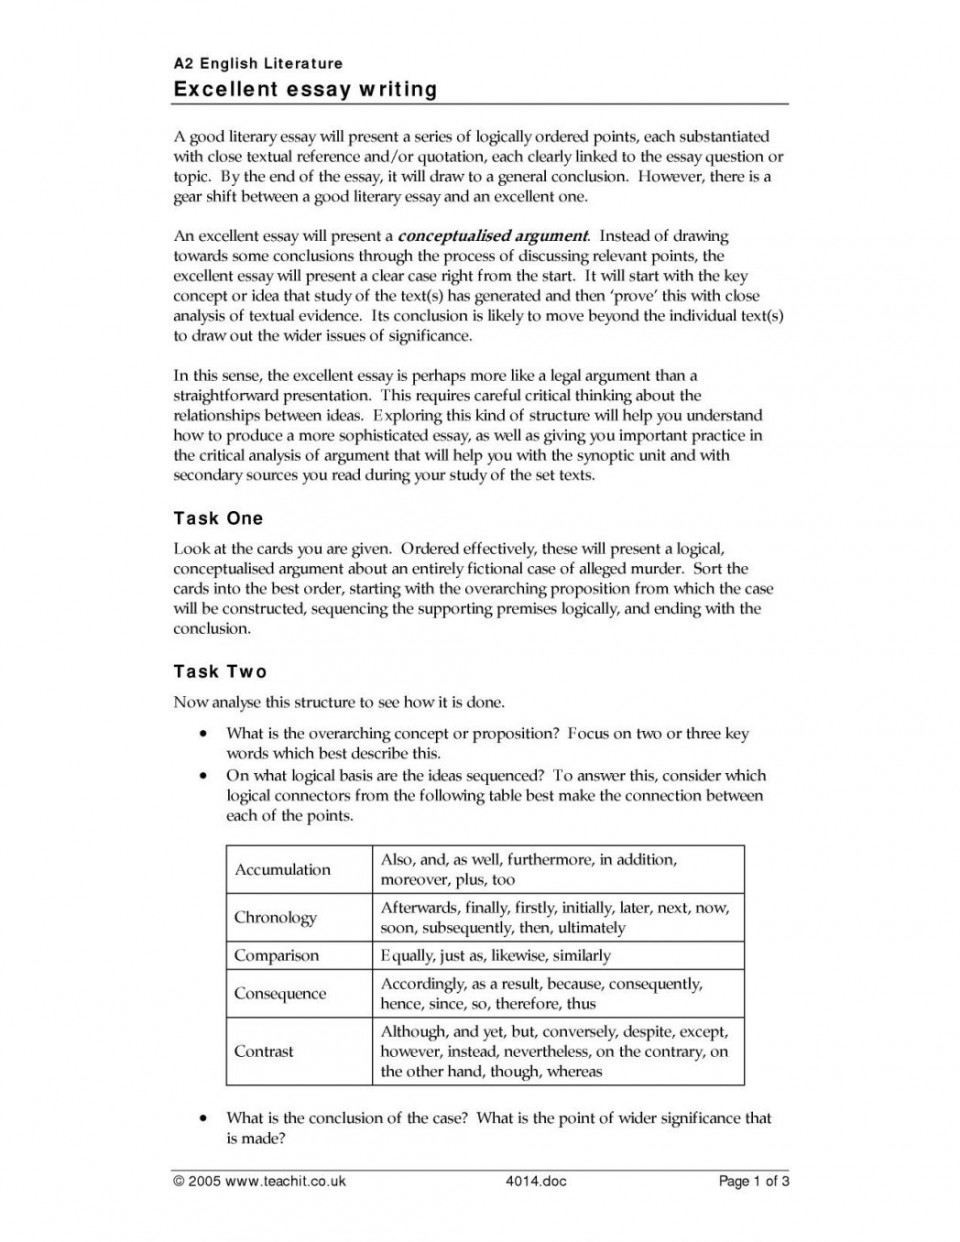 001 Essay On Theme In Literature Homework Academic Writing